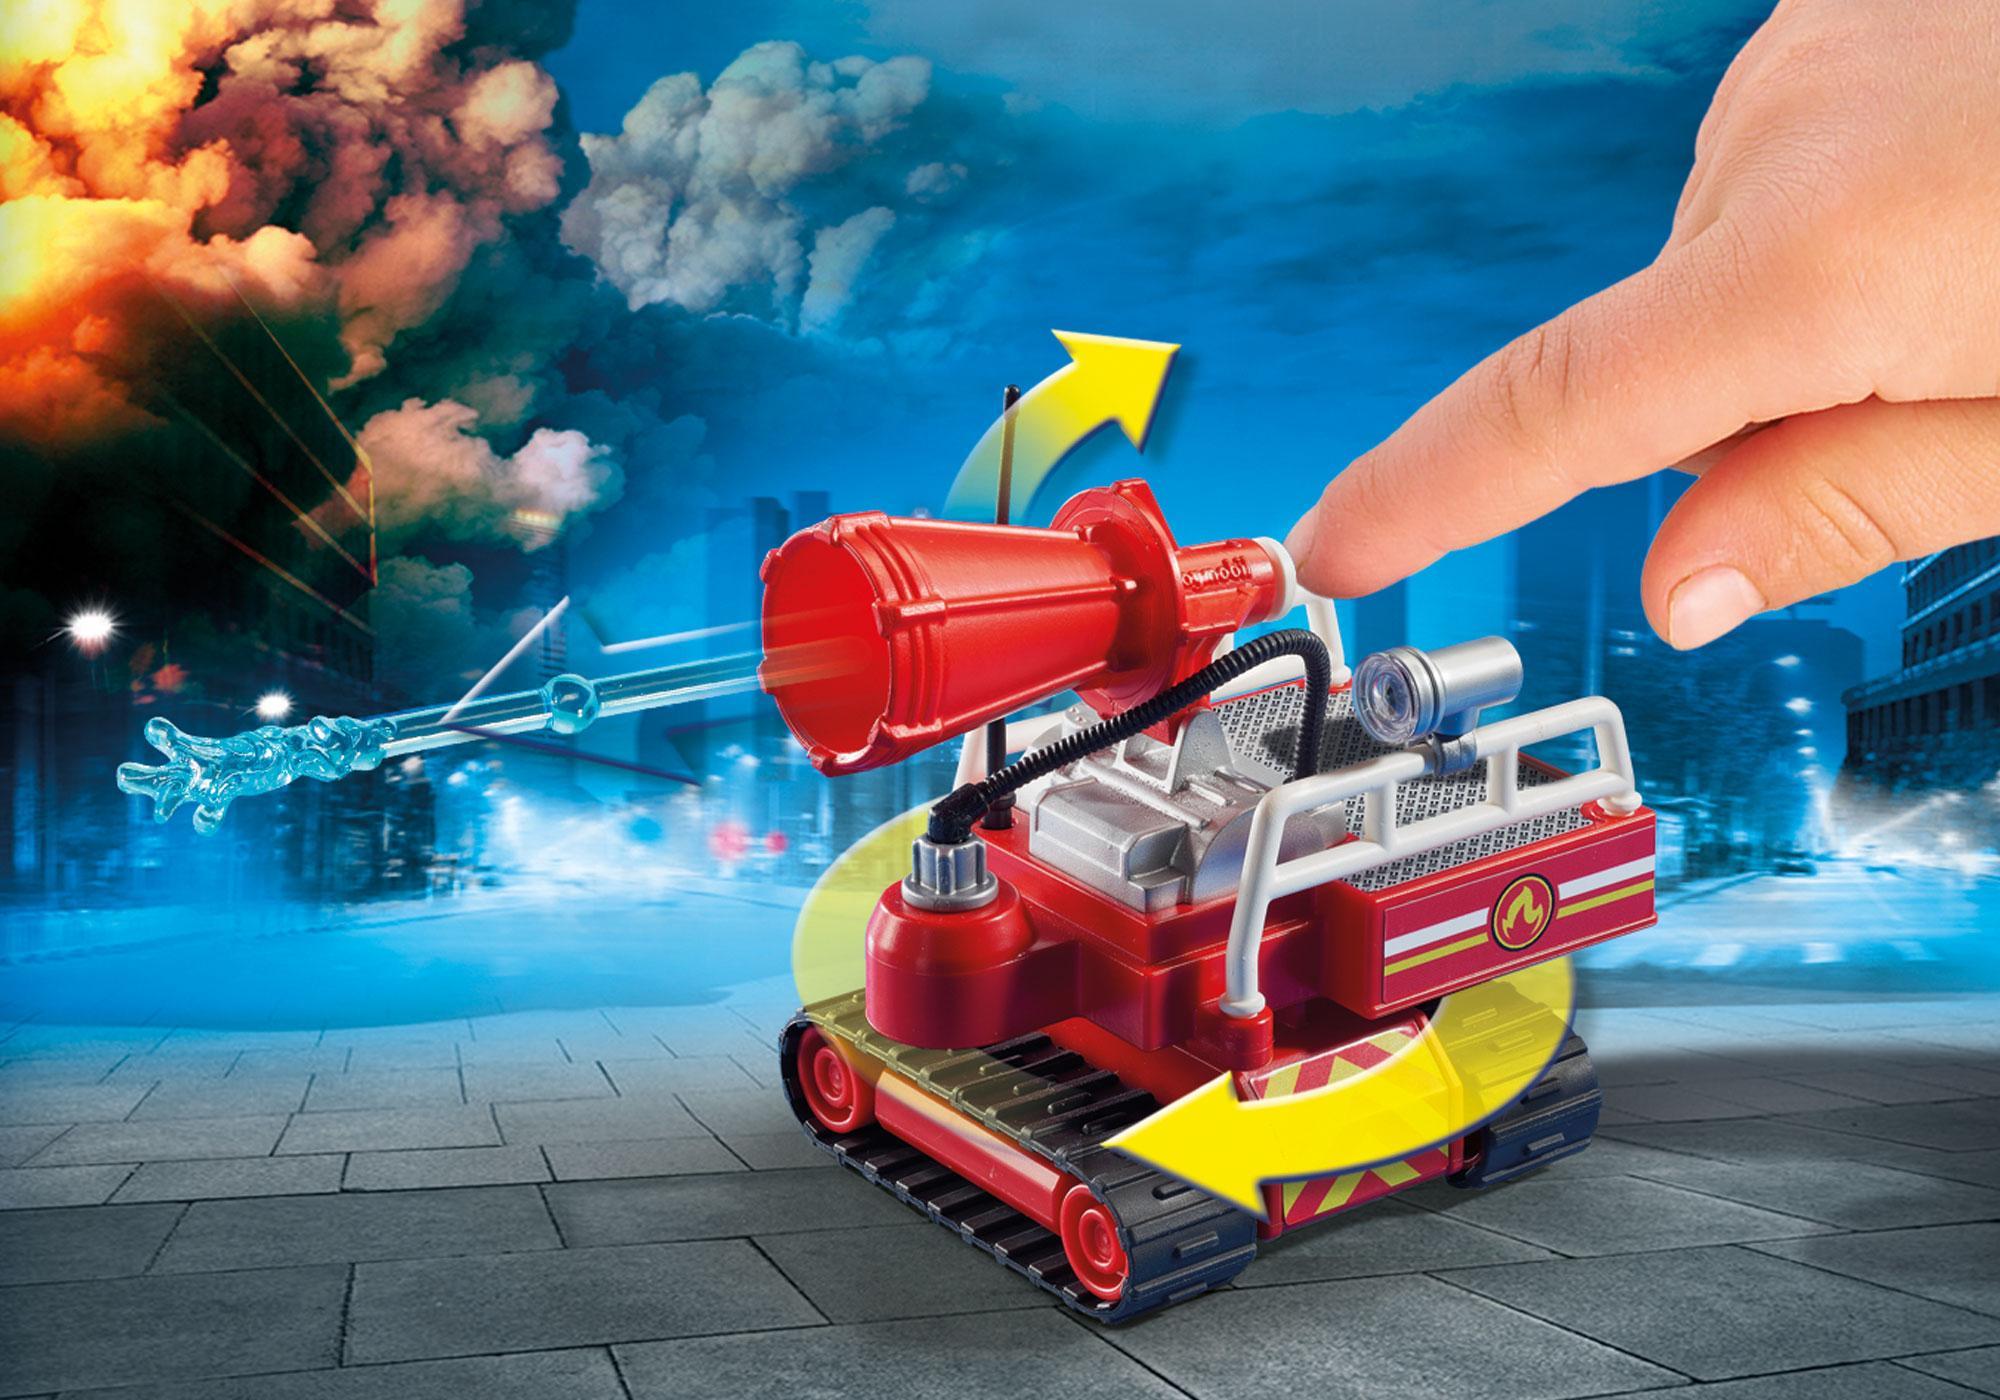 http://media.playmobil.com/i/playmobil/9467_product_extra1/Feuerwehr-Löschroboter